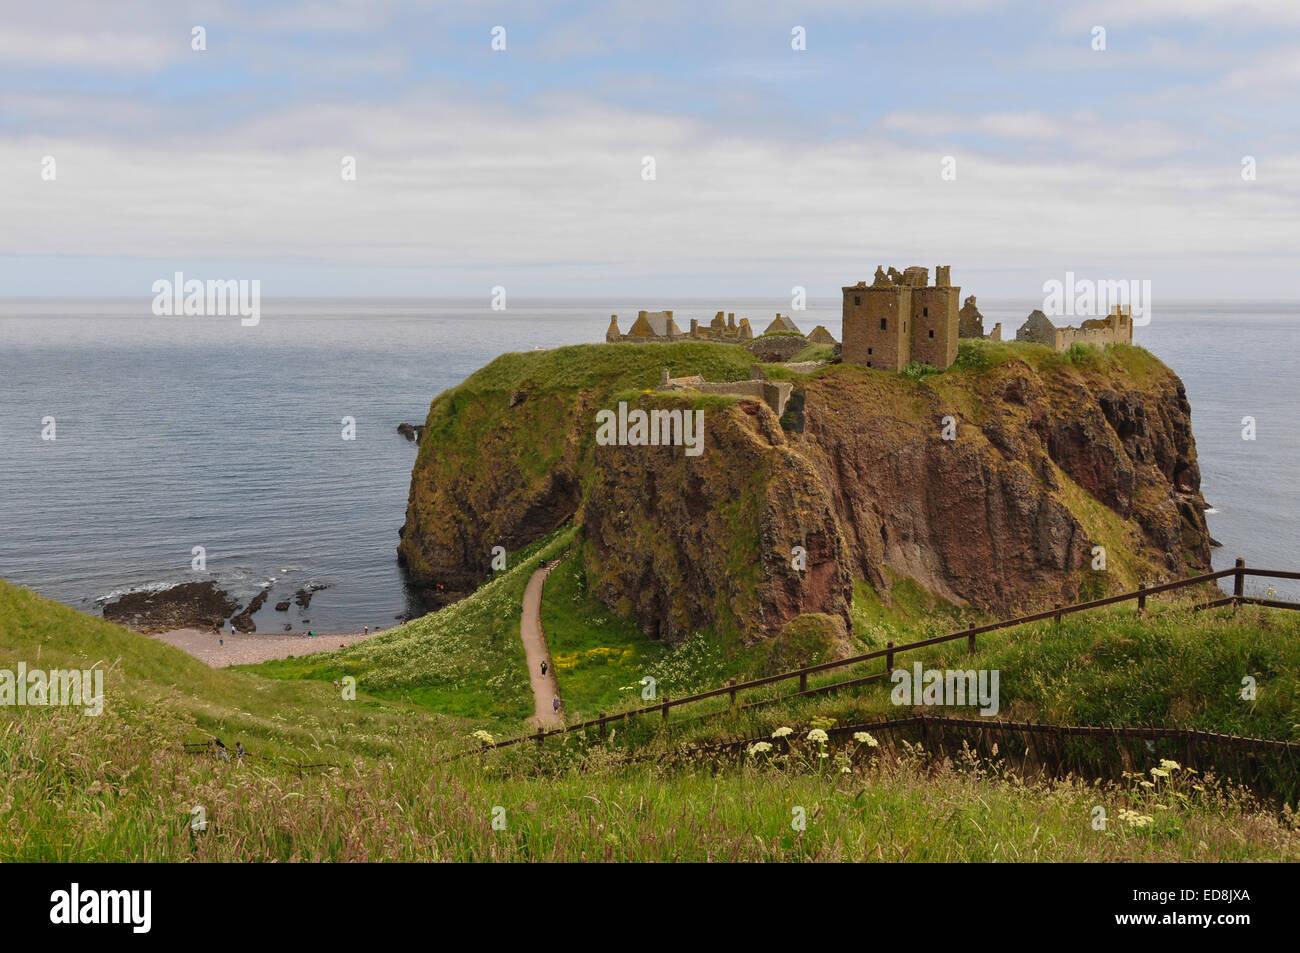 Dunnottar Castle, Stonehaven, Aberdeenshire, Scotland - Stock Image